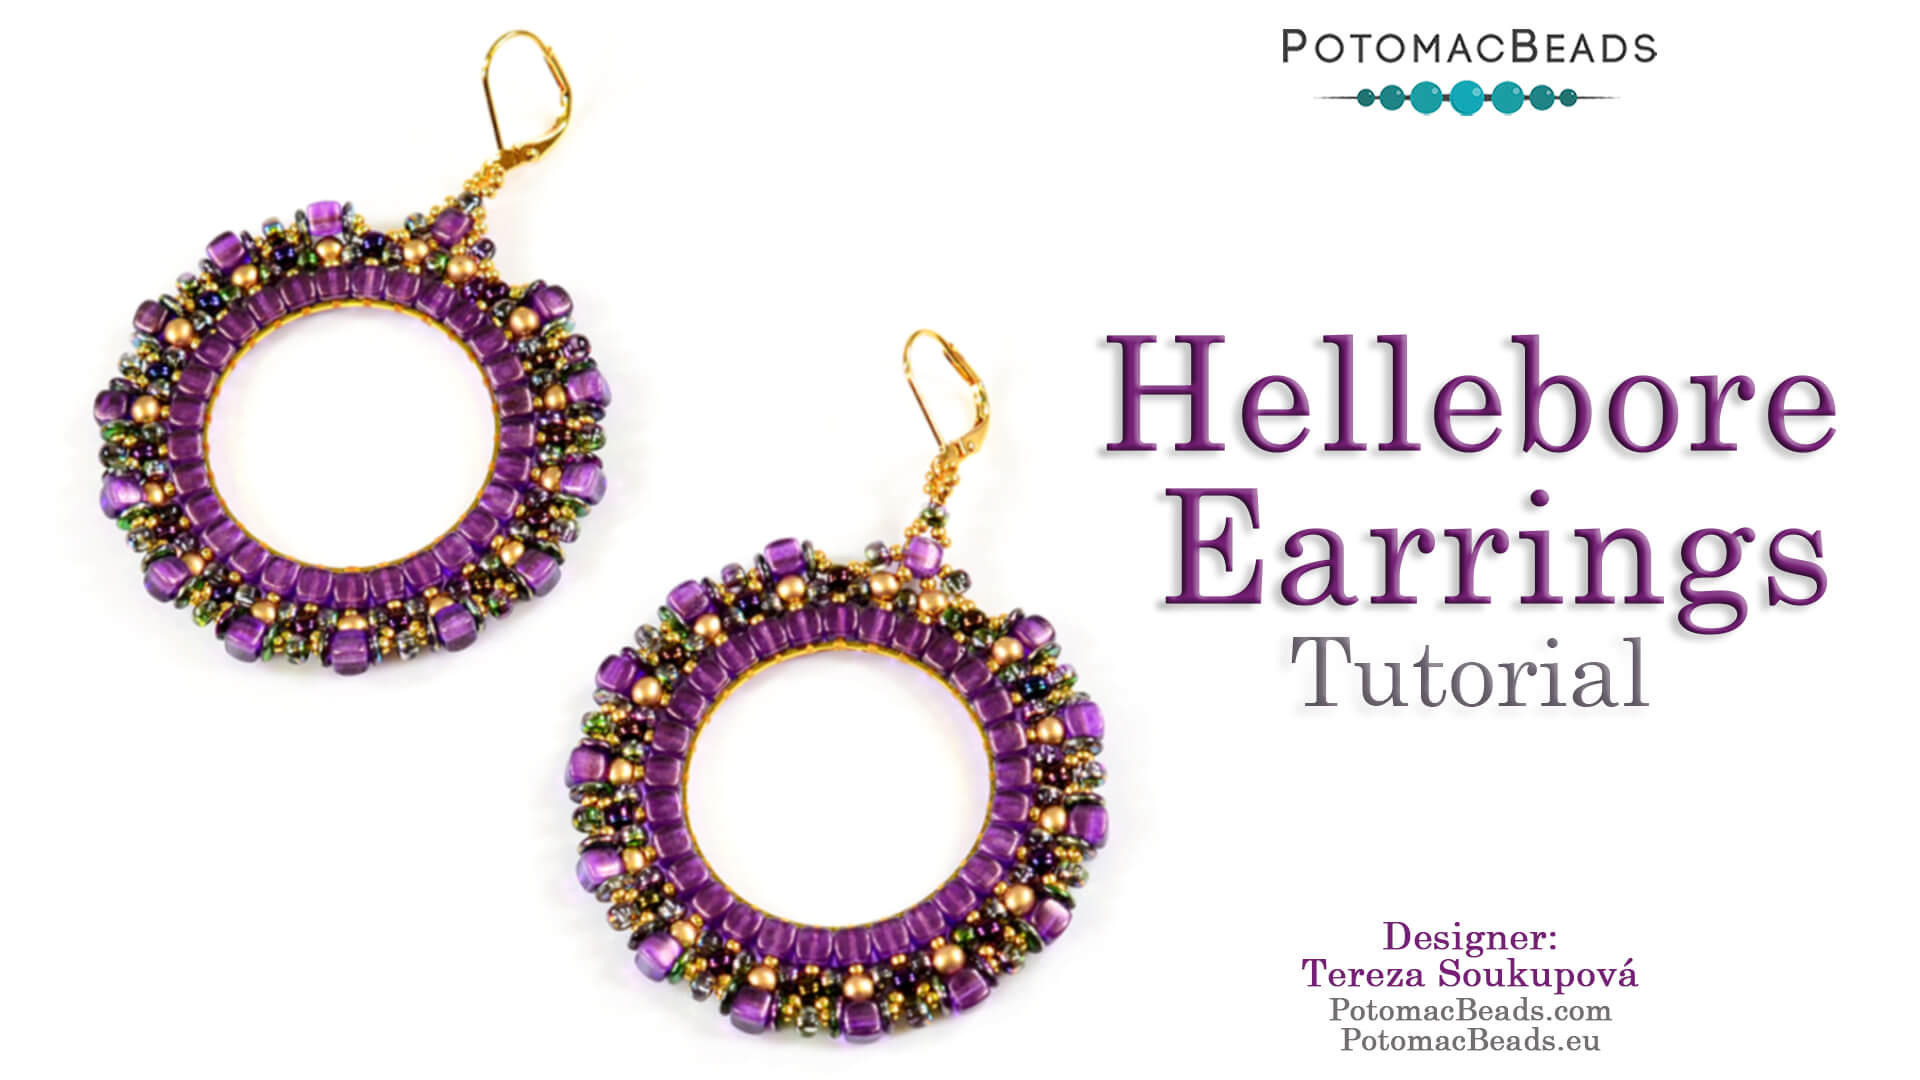 How to Bead / Videos Sorted by Beads / O Bead Videos / Hellebore Earrings Tutorial